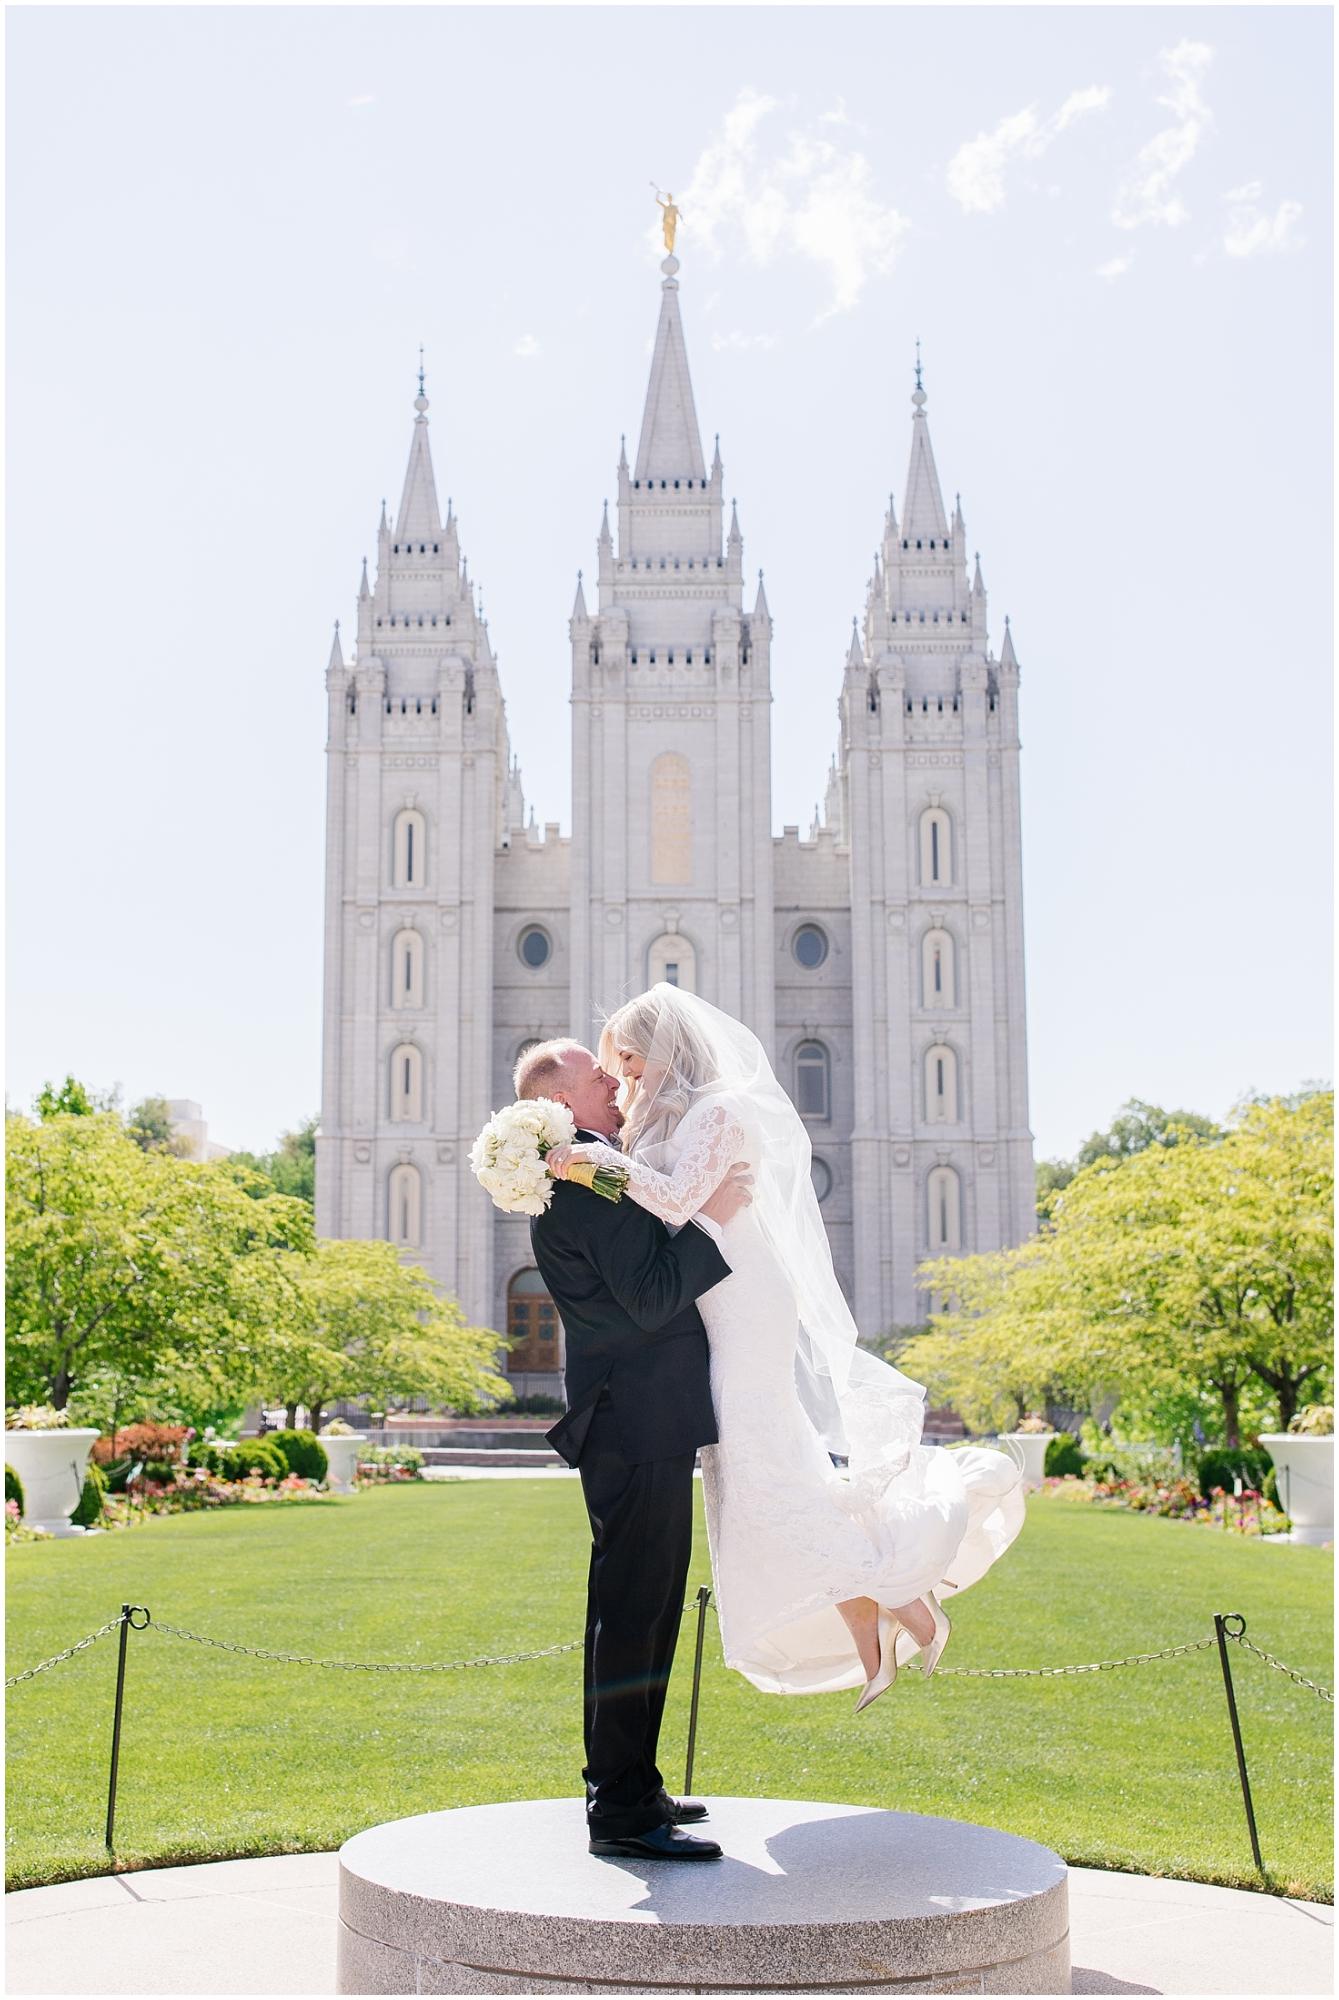 CherylandTyler-305_Lizzie-B-Imagery-Utah-Wedding-Photographer-Park-City-Salt-Lake-City-Temple-Wells-Fargo-Building.jpg